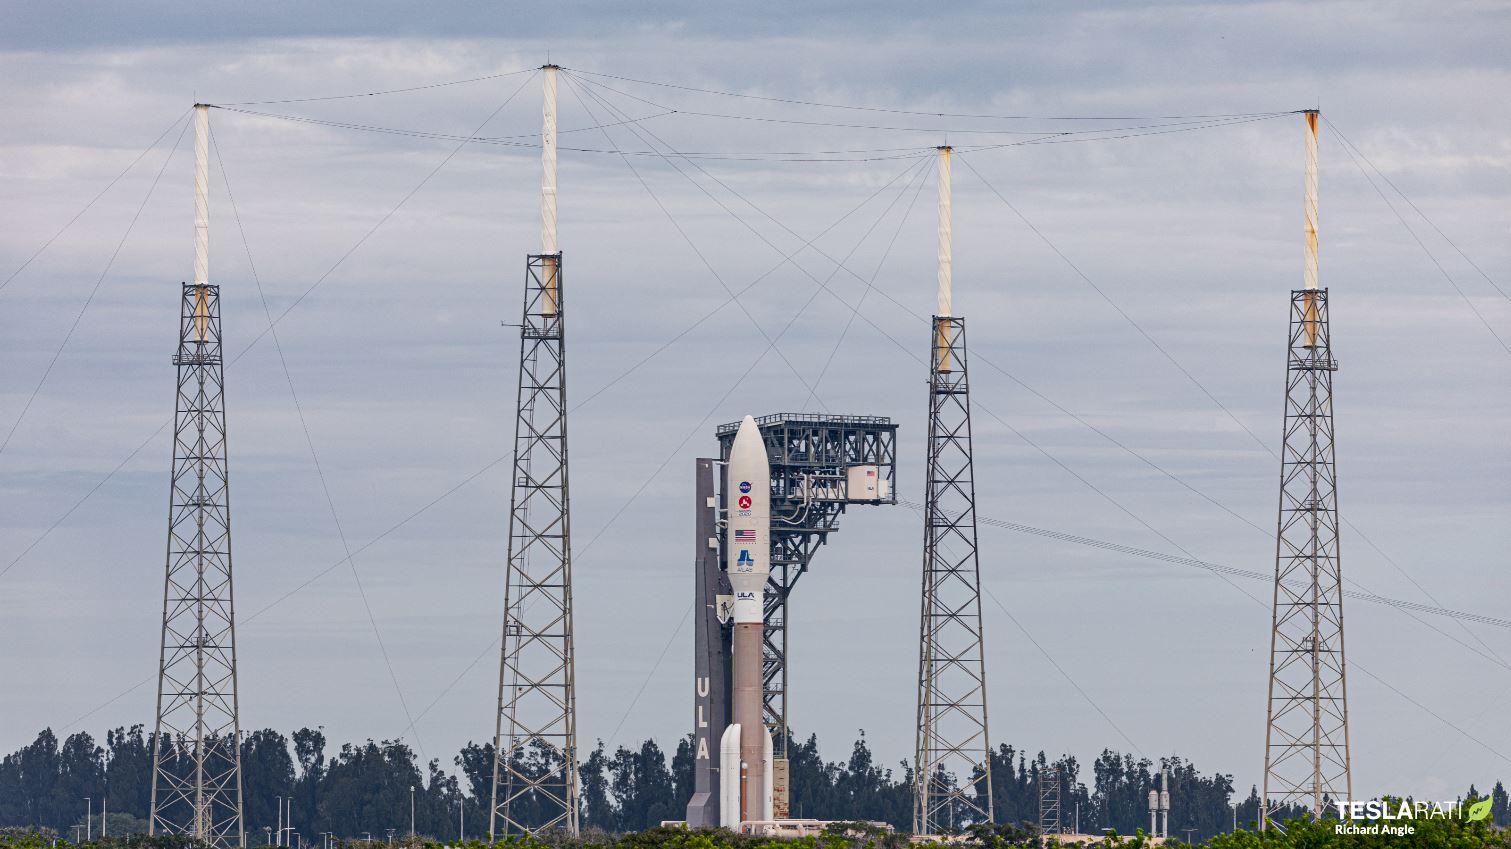 NASA-perseverance-mars-rover-rollout_Richard-Angle_teslarati-